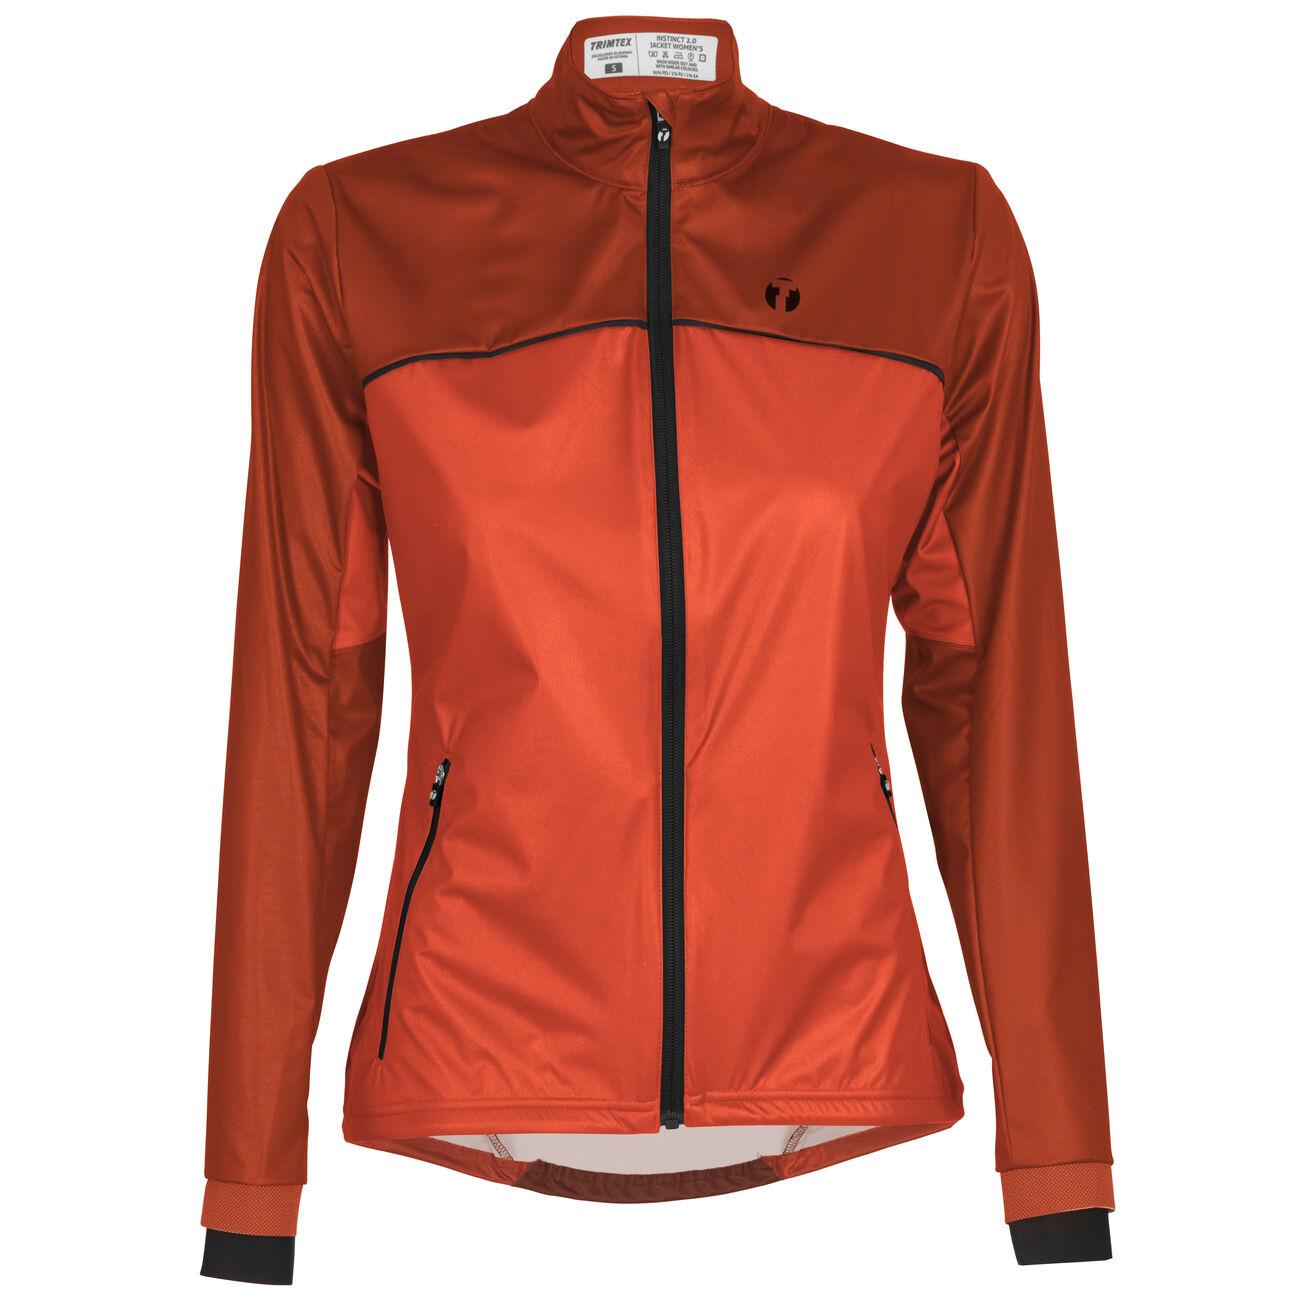 Instinct 2.0 running jacket women's